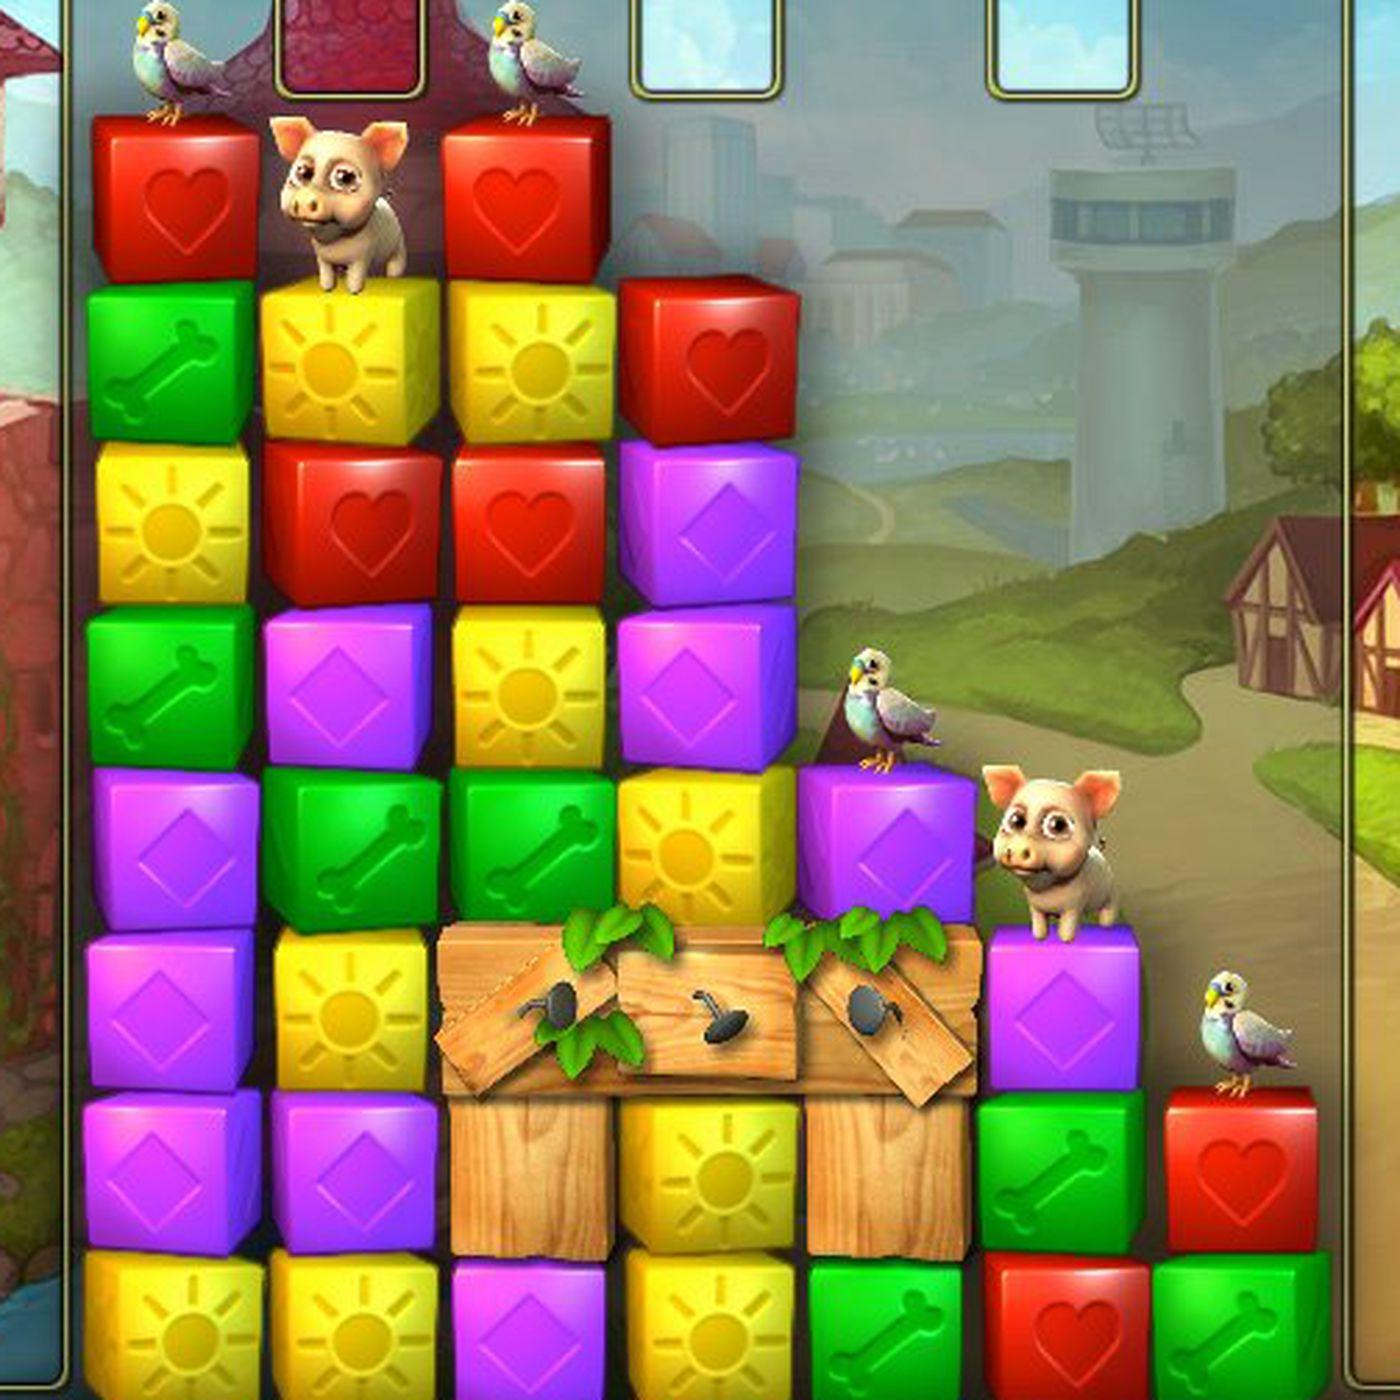 Developer King to release Facebook title Pet Rescue Saga for